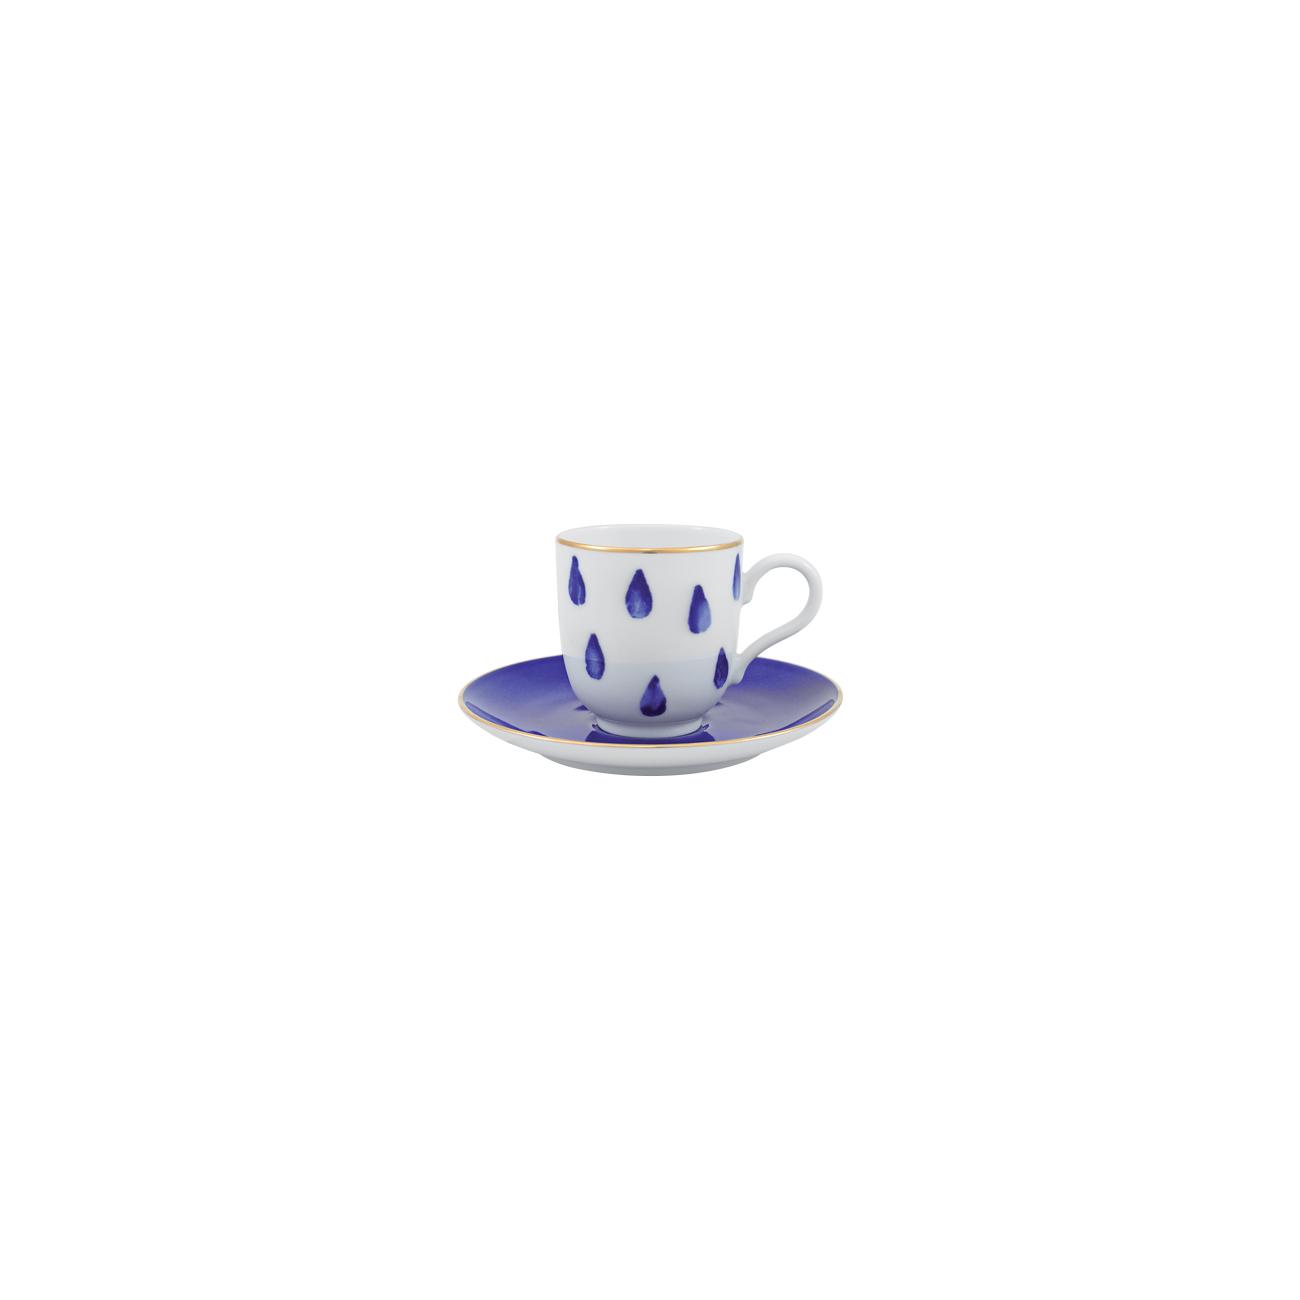 Chávena Café 11cl Antar + Pires 12cm Olympus 0